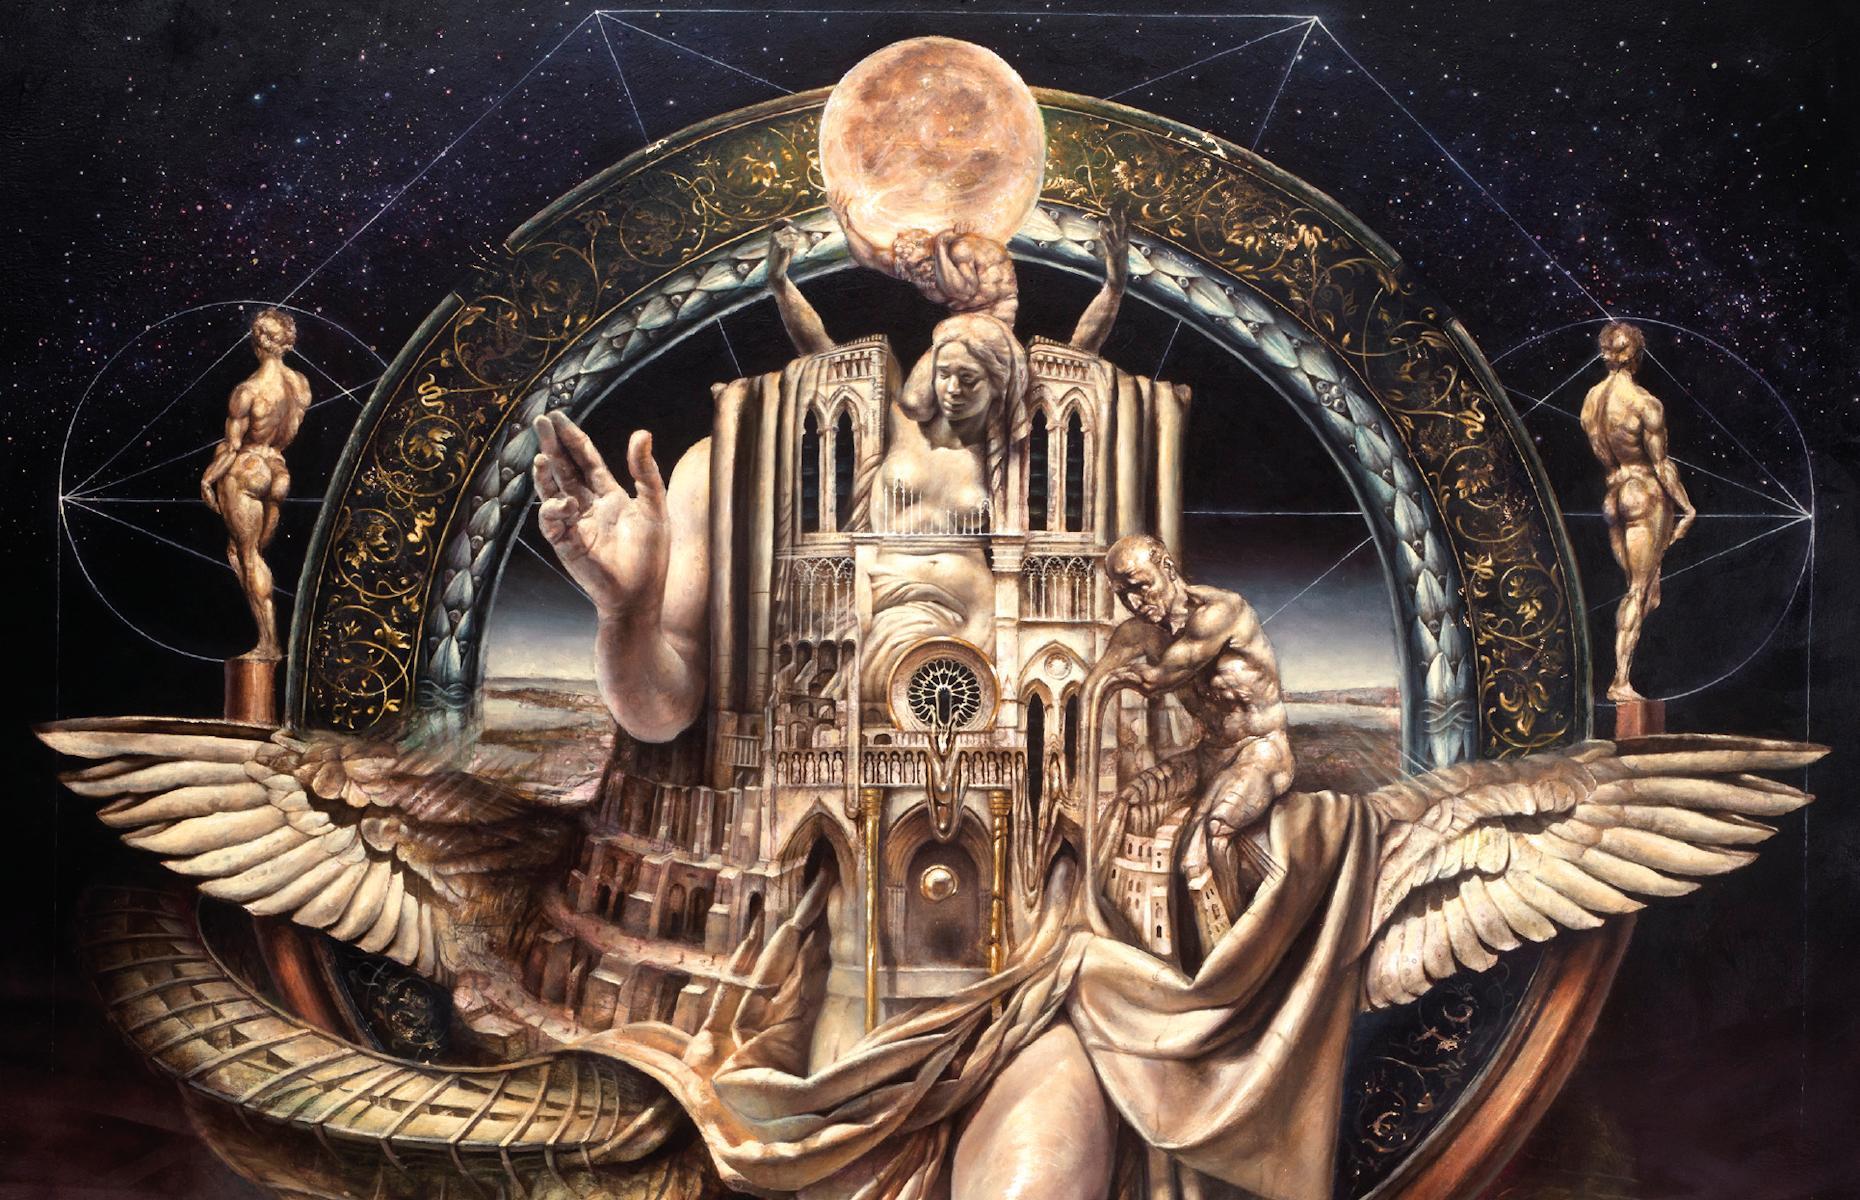 Fantasy Art. Contemporary Art Auction